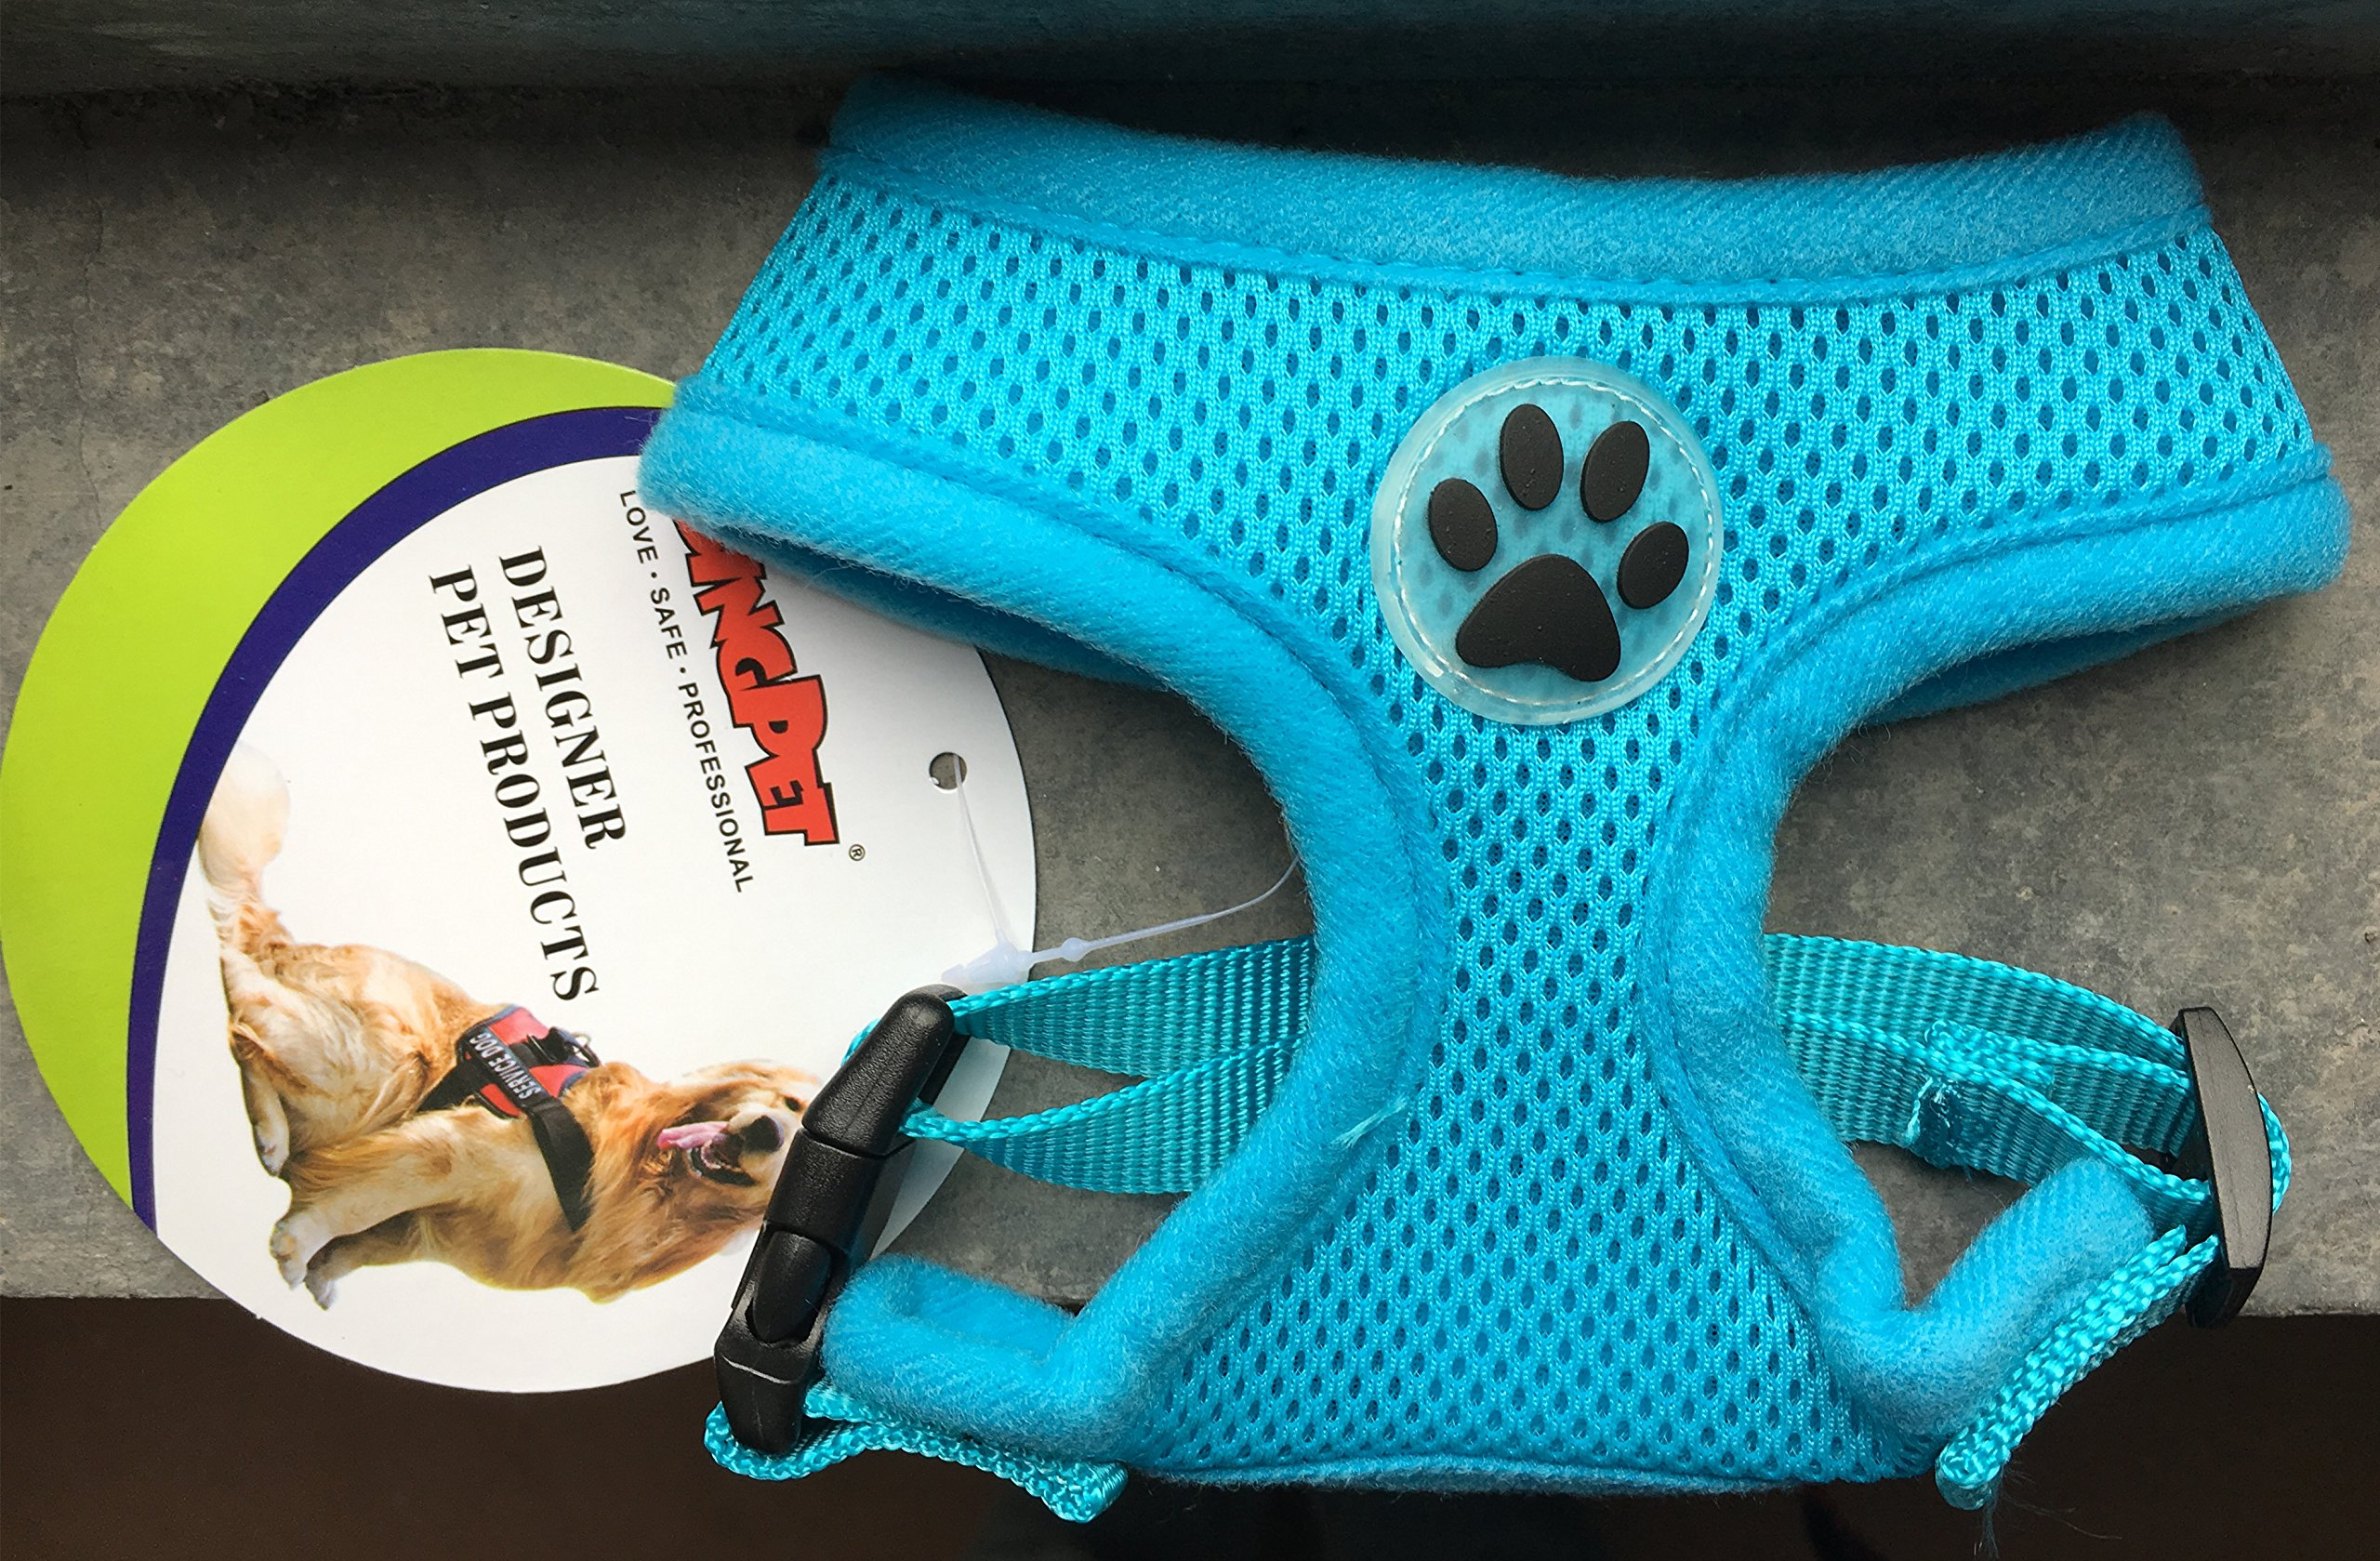 BINGPET BB5001 Soft Mesh Dog Harness Pet Walking Vest Puppy Padded Harnesses Adjustable, Blue Large by BINGPET (Image #7)